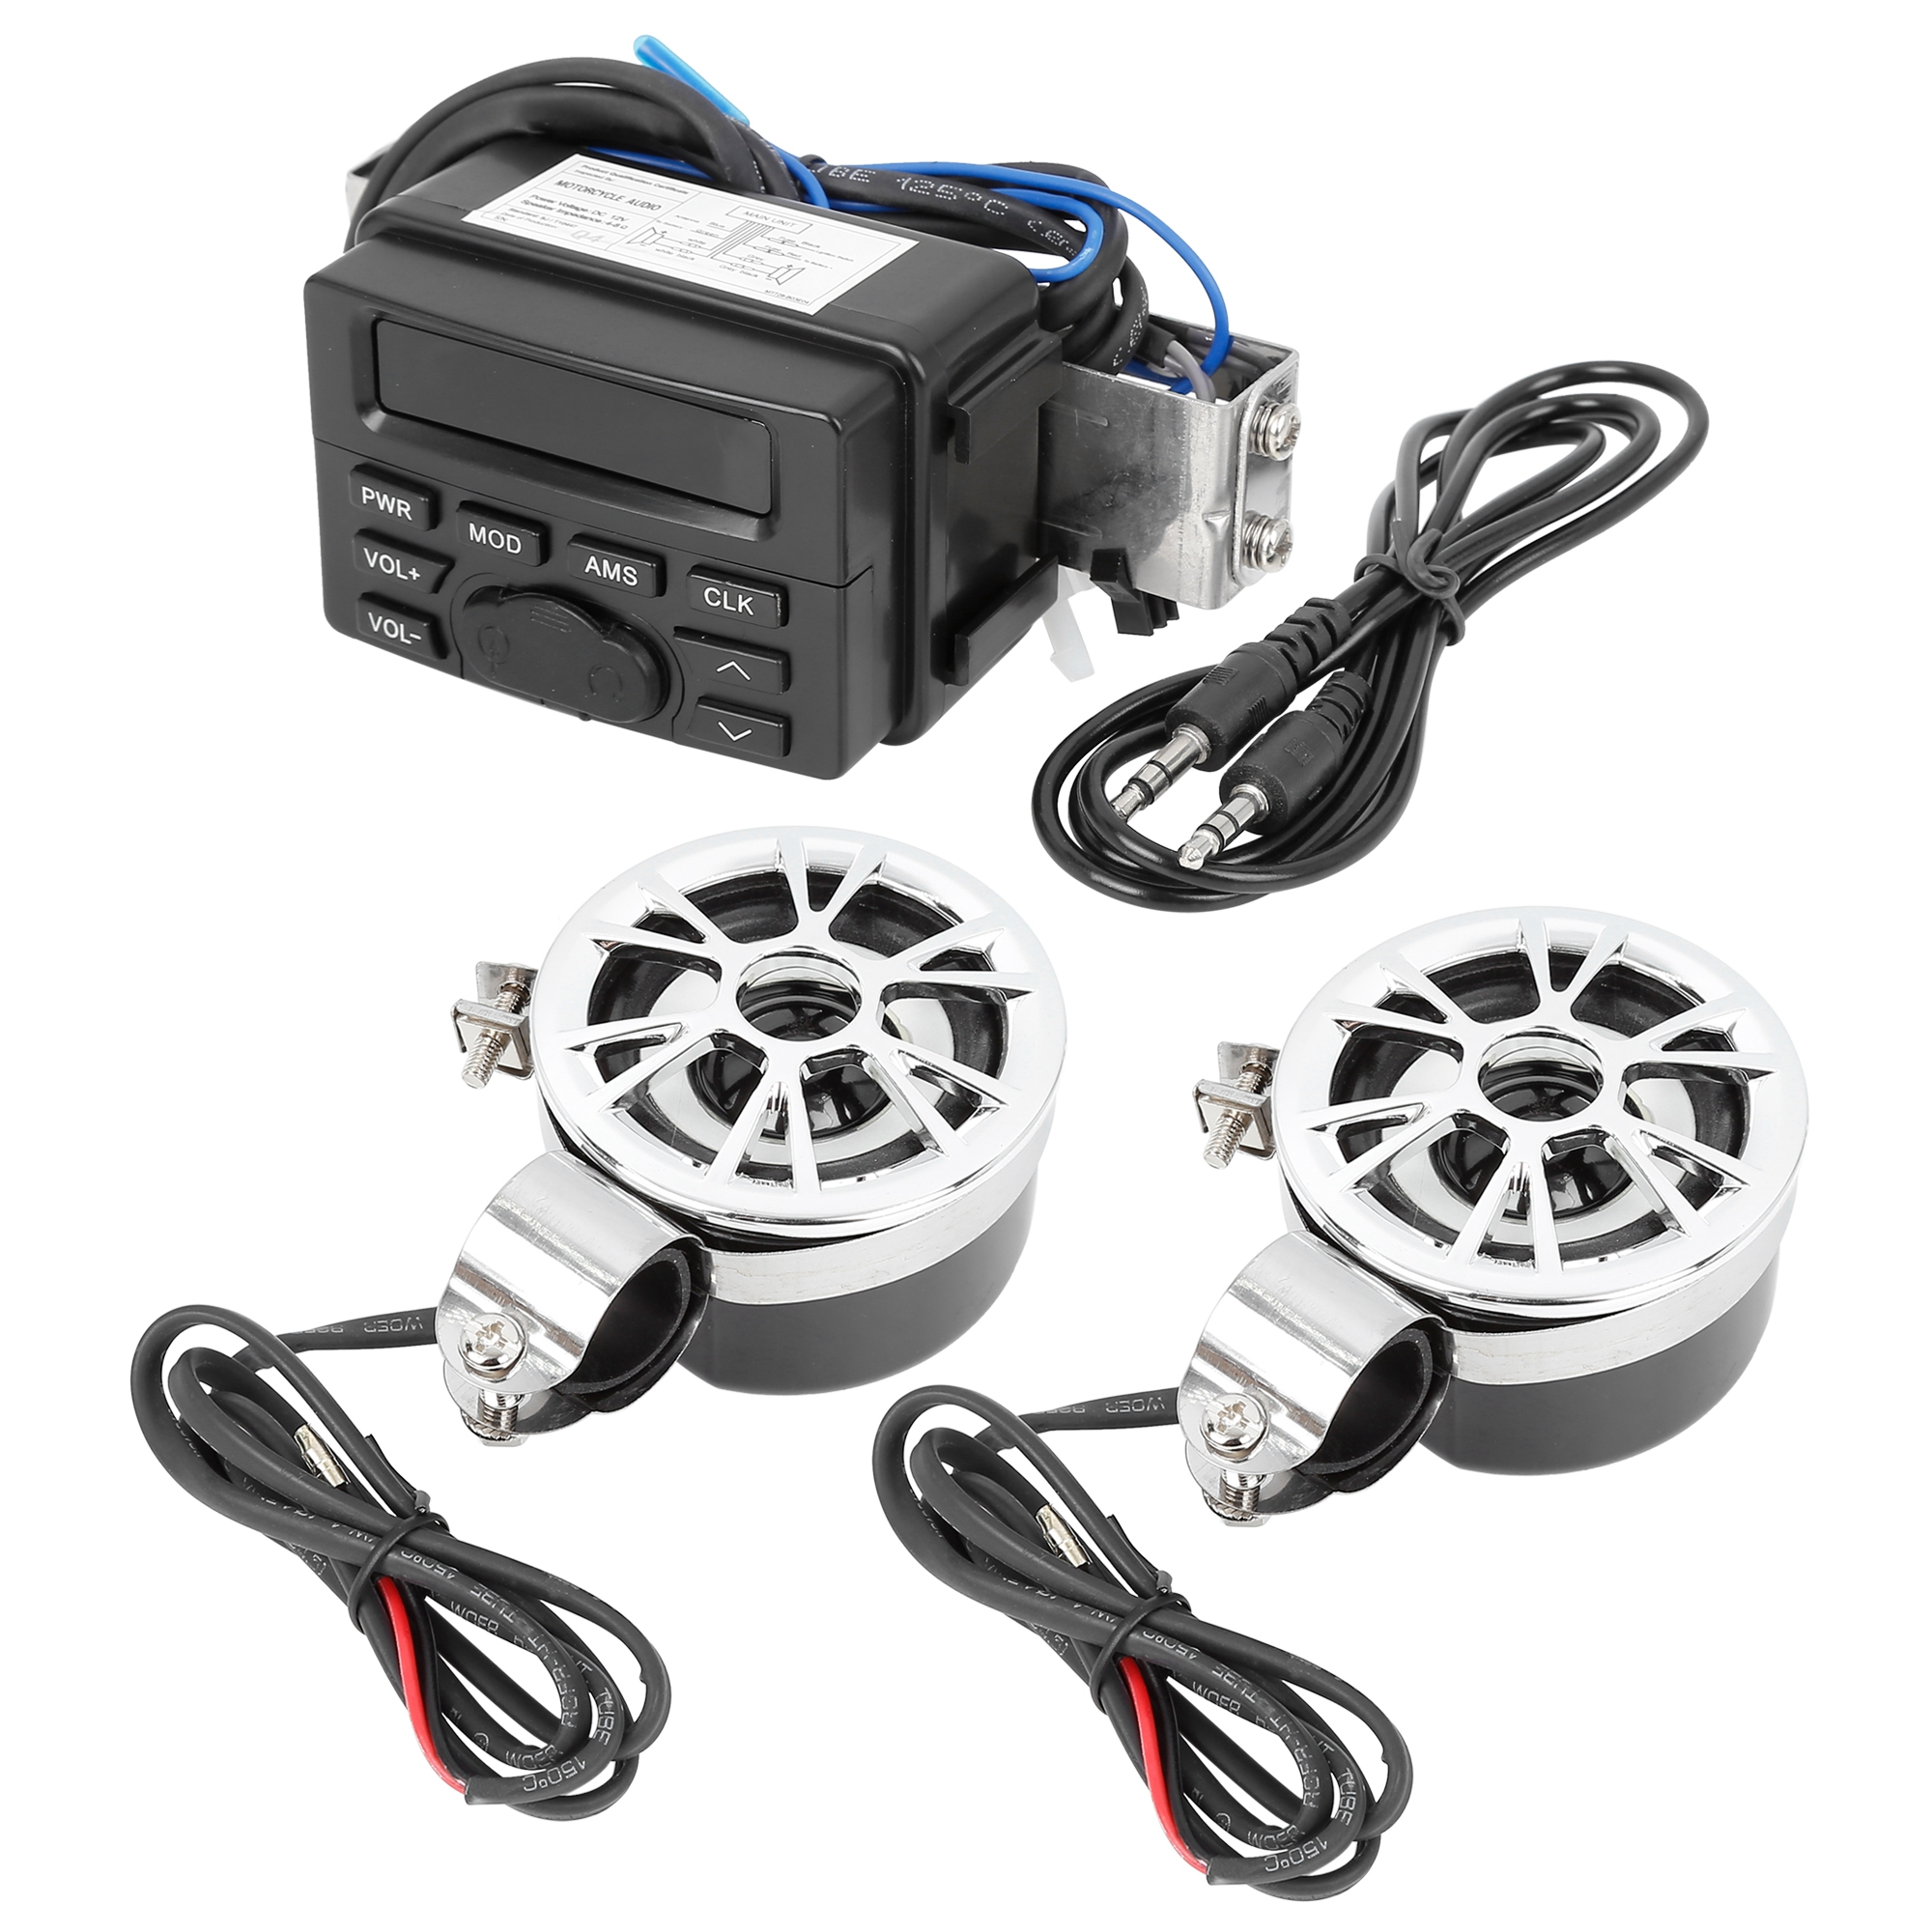 Motorcycle ATV Handlebar Audio FM Radio Stereo Amplifier Speaker MP3 Player Kit